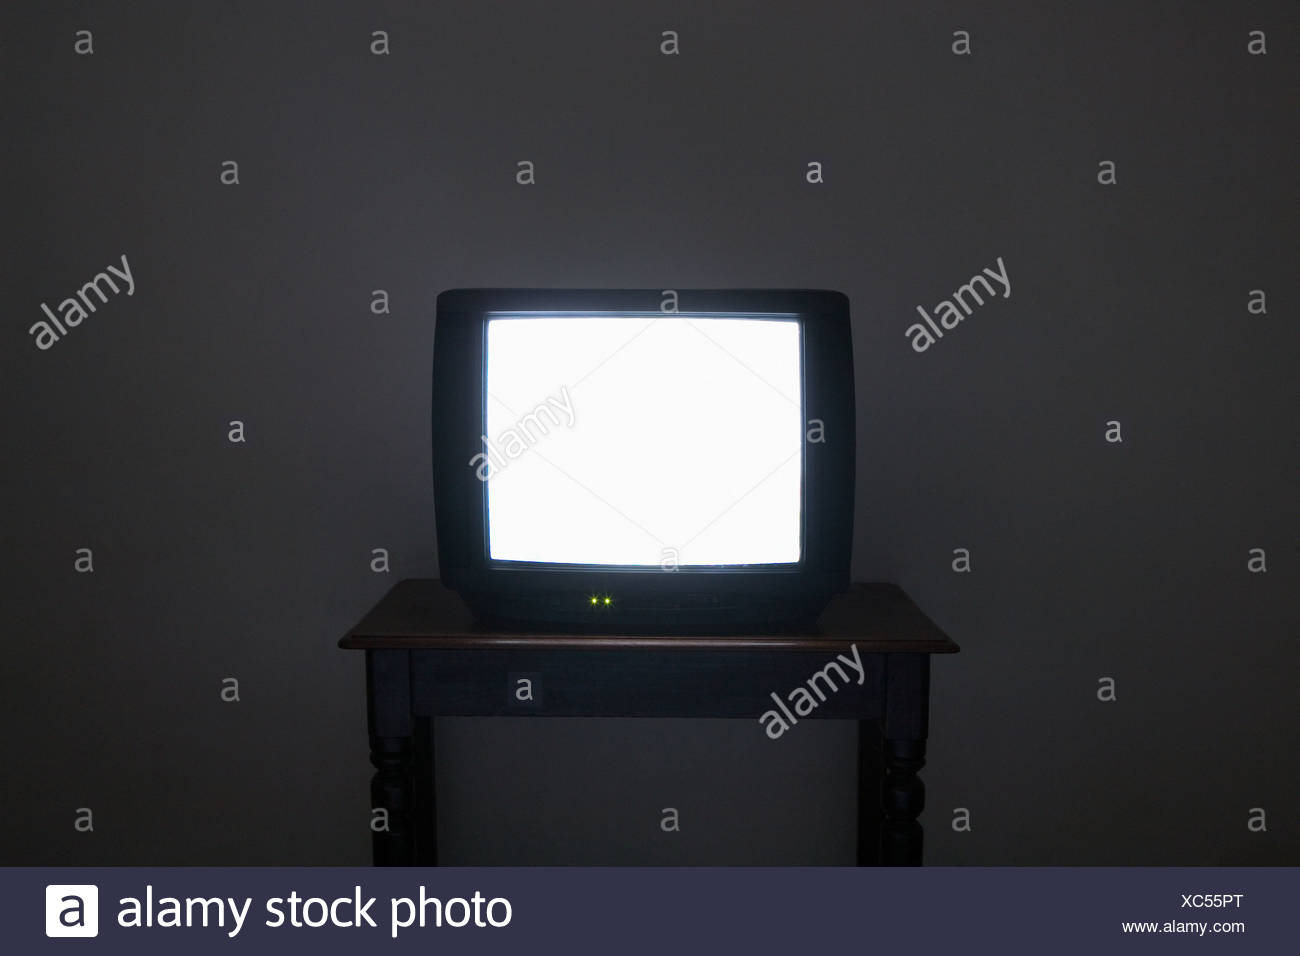 Illuminated television screen - Stock Image